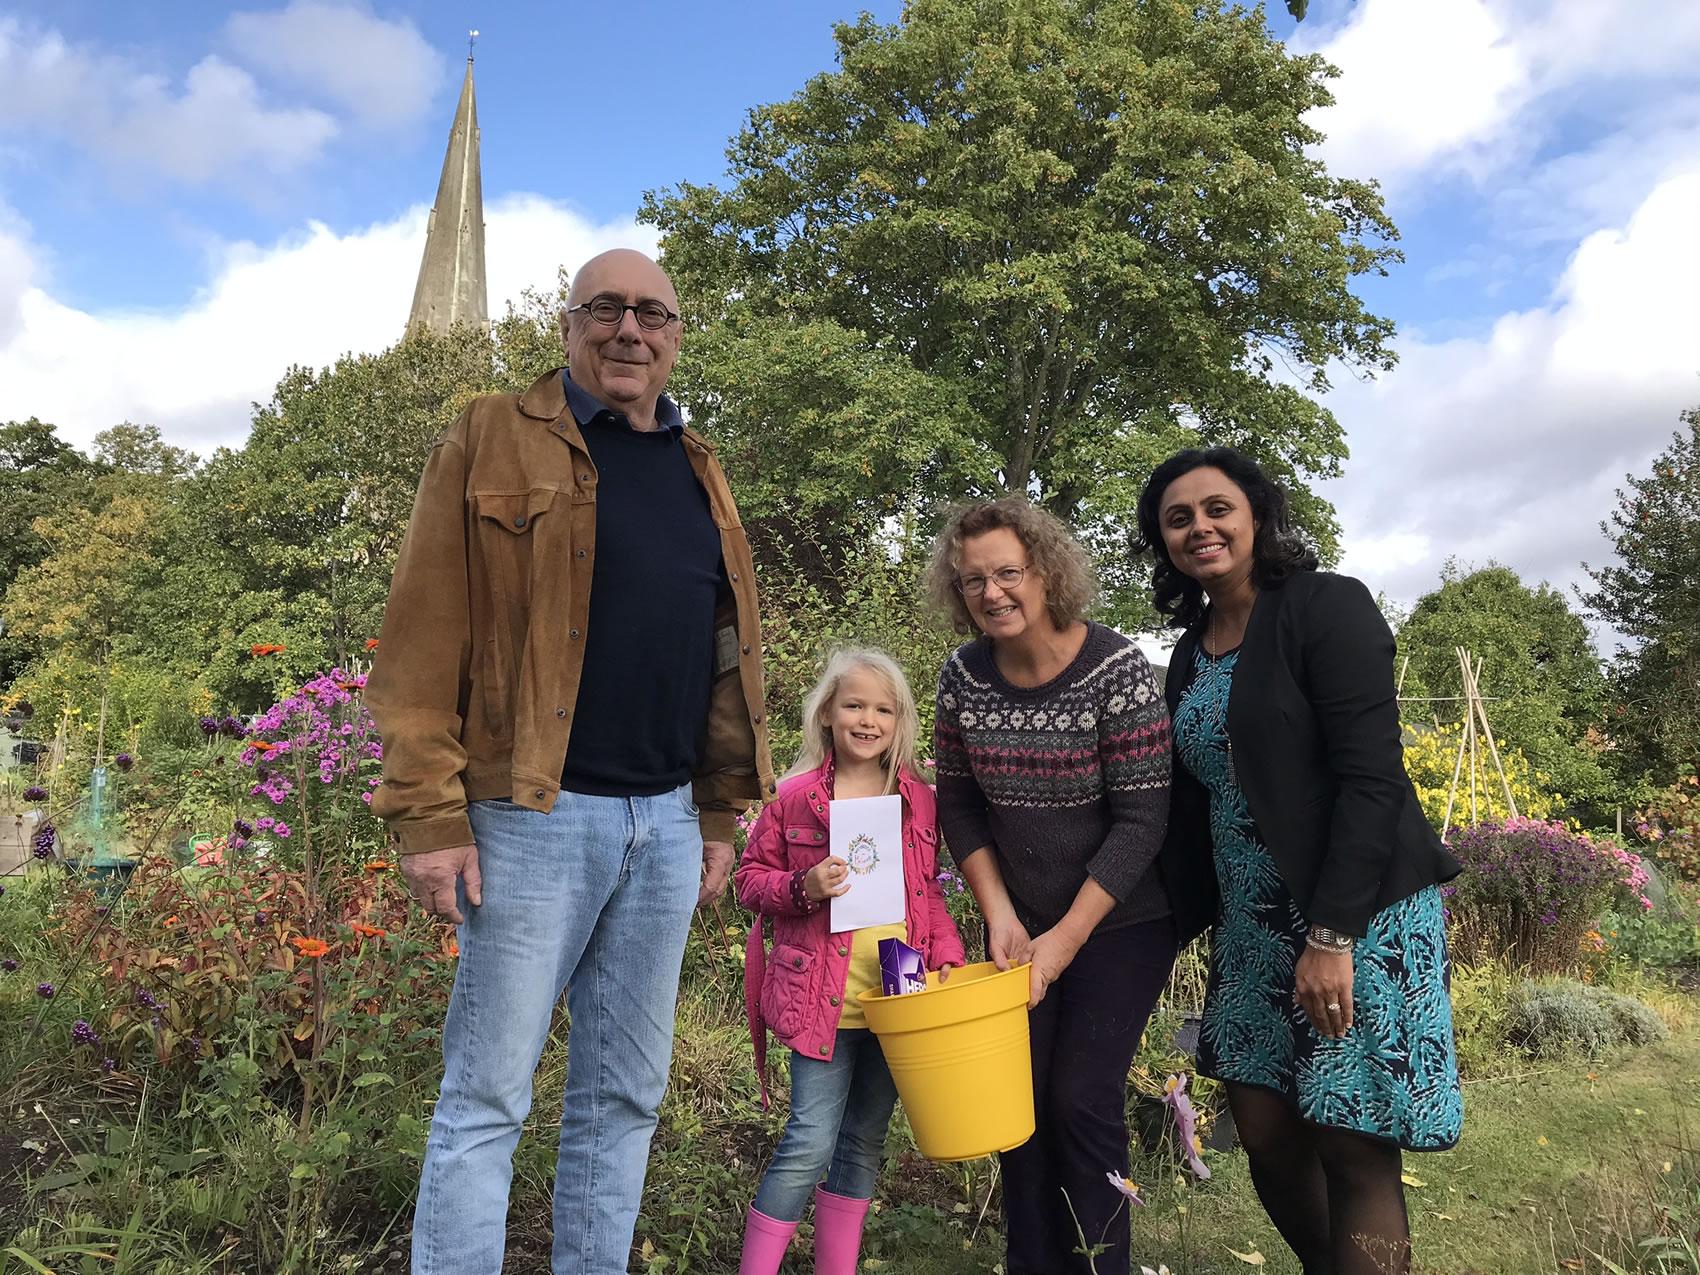 Children's Sunflower Competition Winner - Weybridge In Bloom and Allotments Association